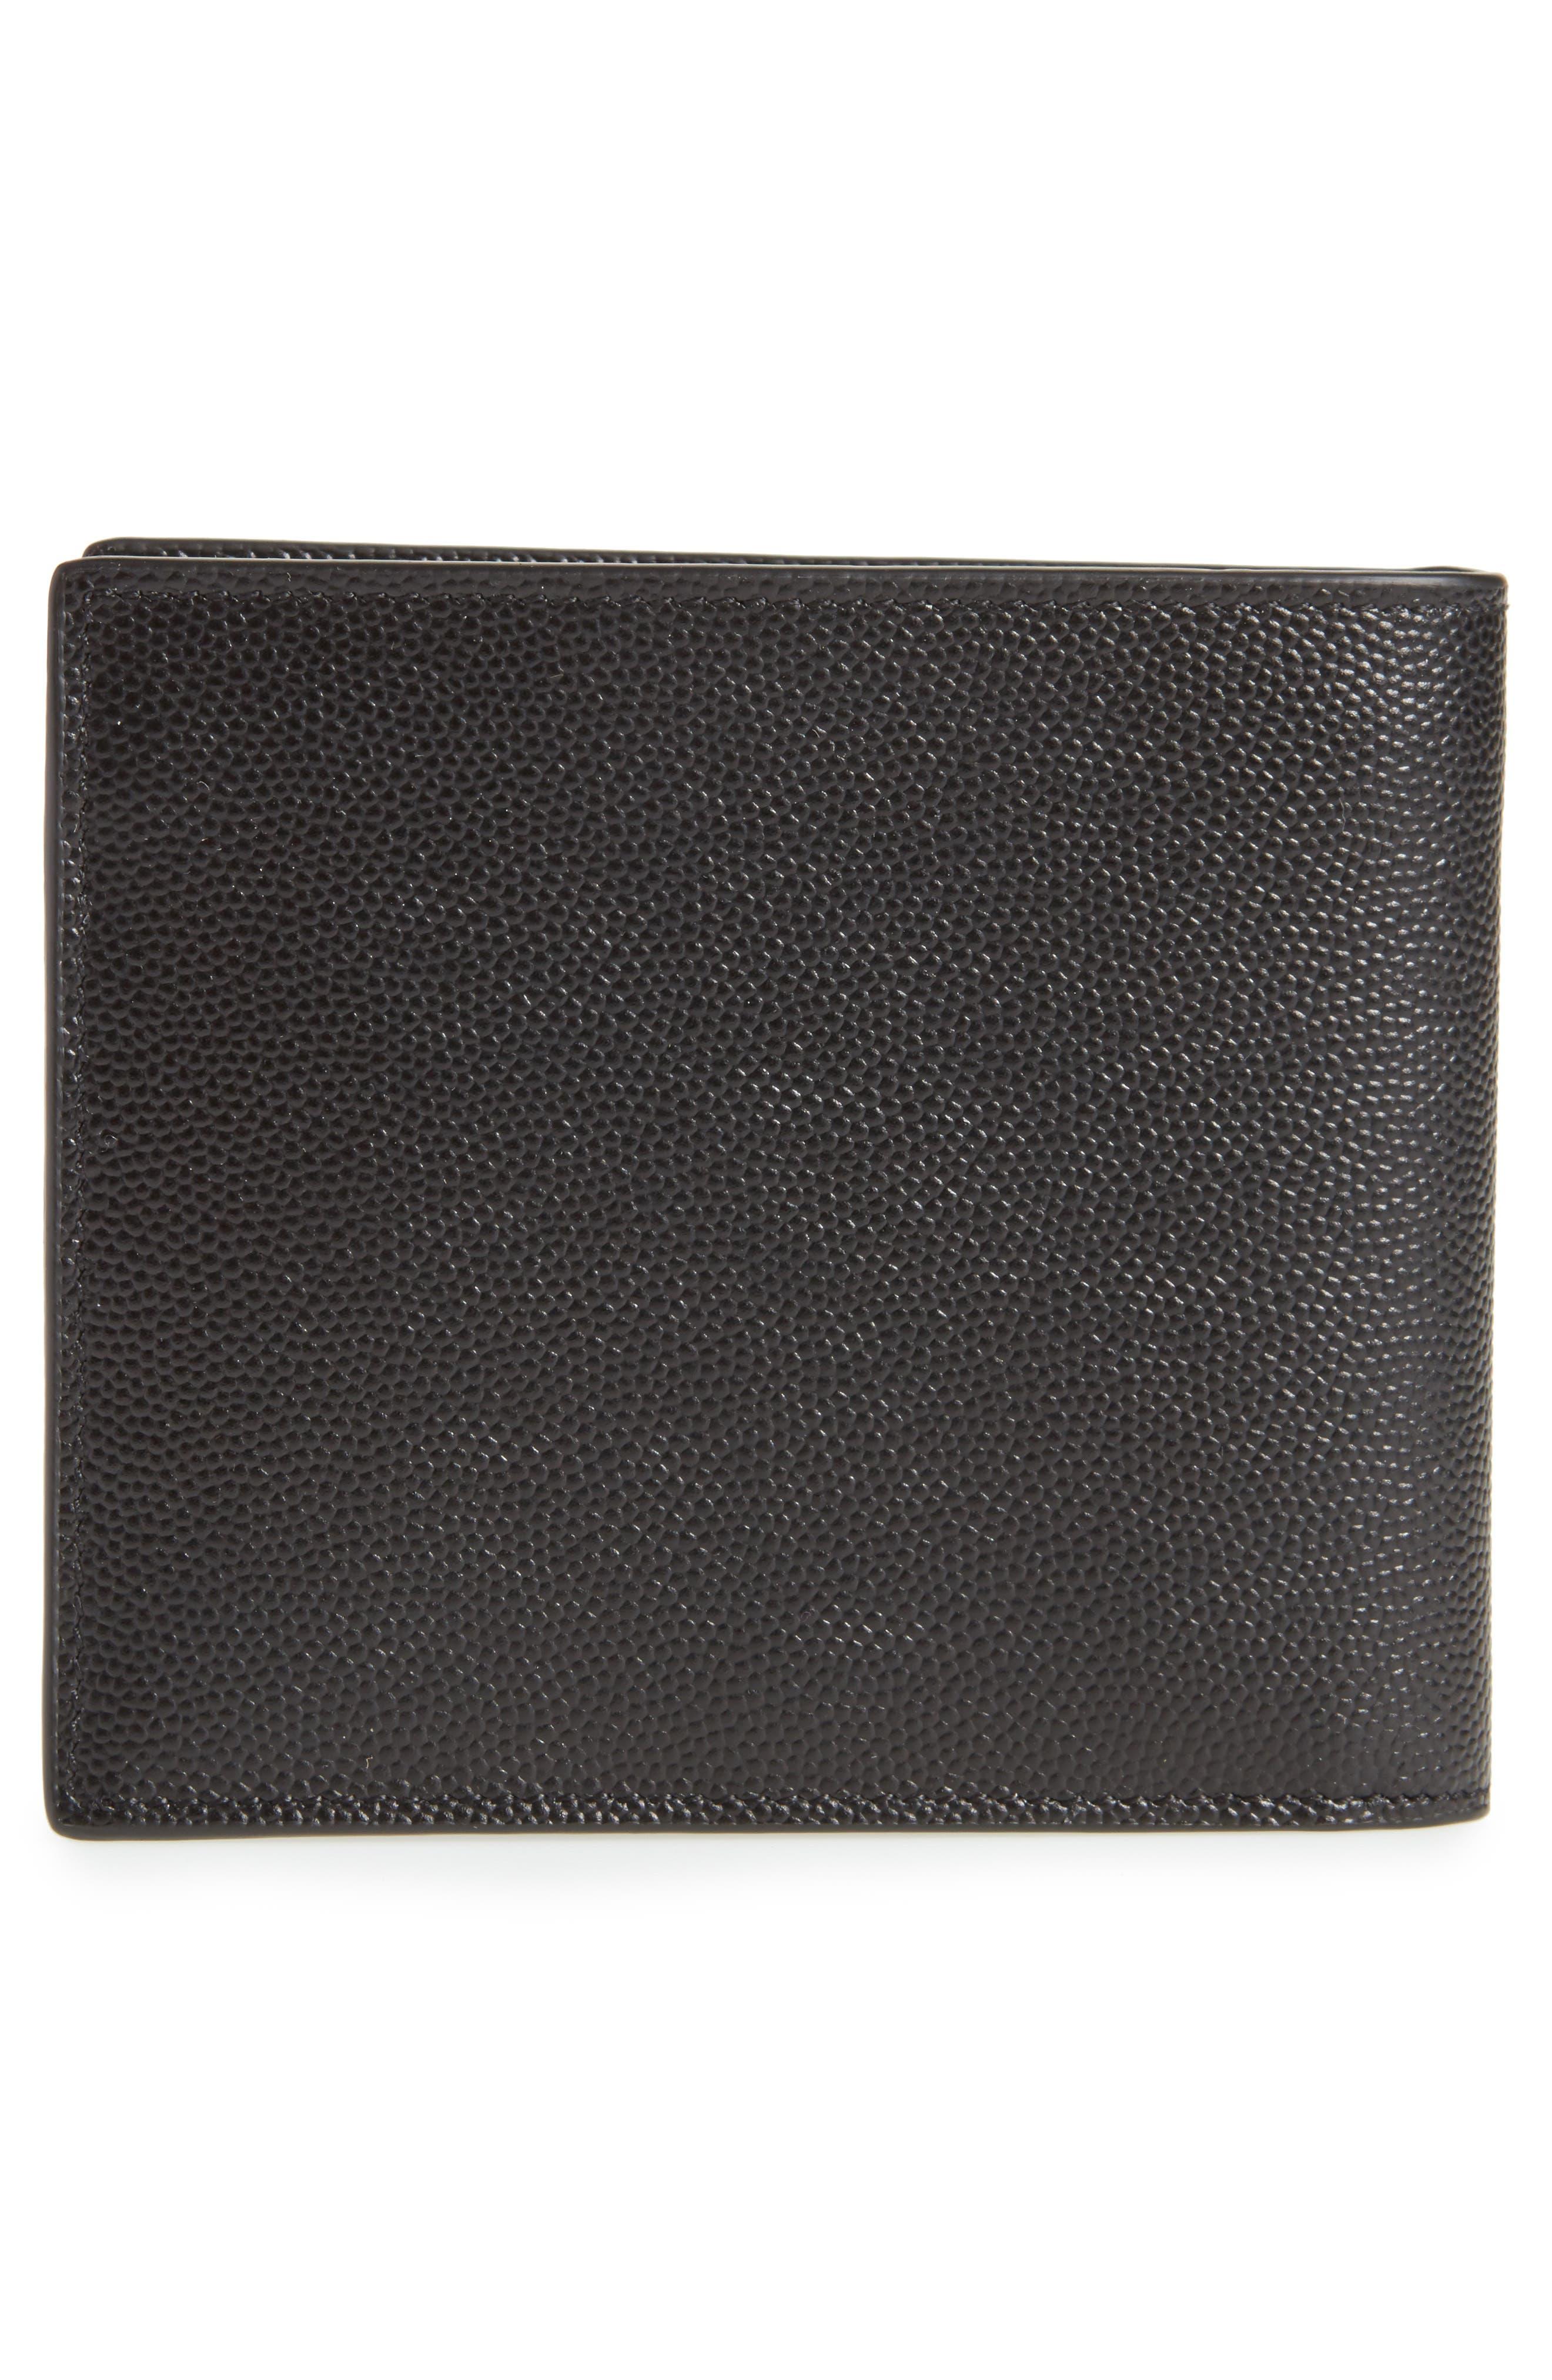 Pebble Grain Leather Wallet,                             Alternate thumbnail 3, color,                             001